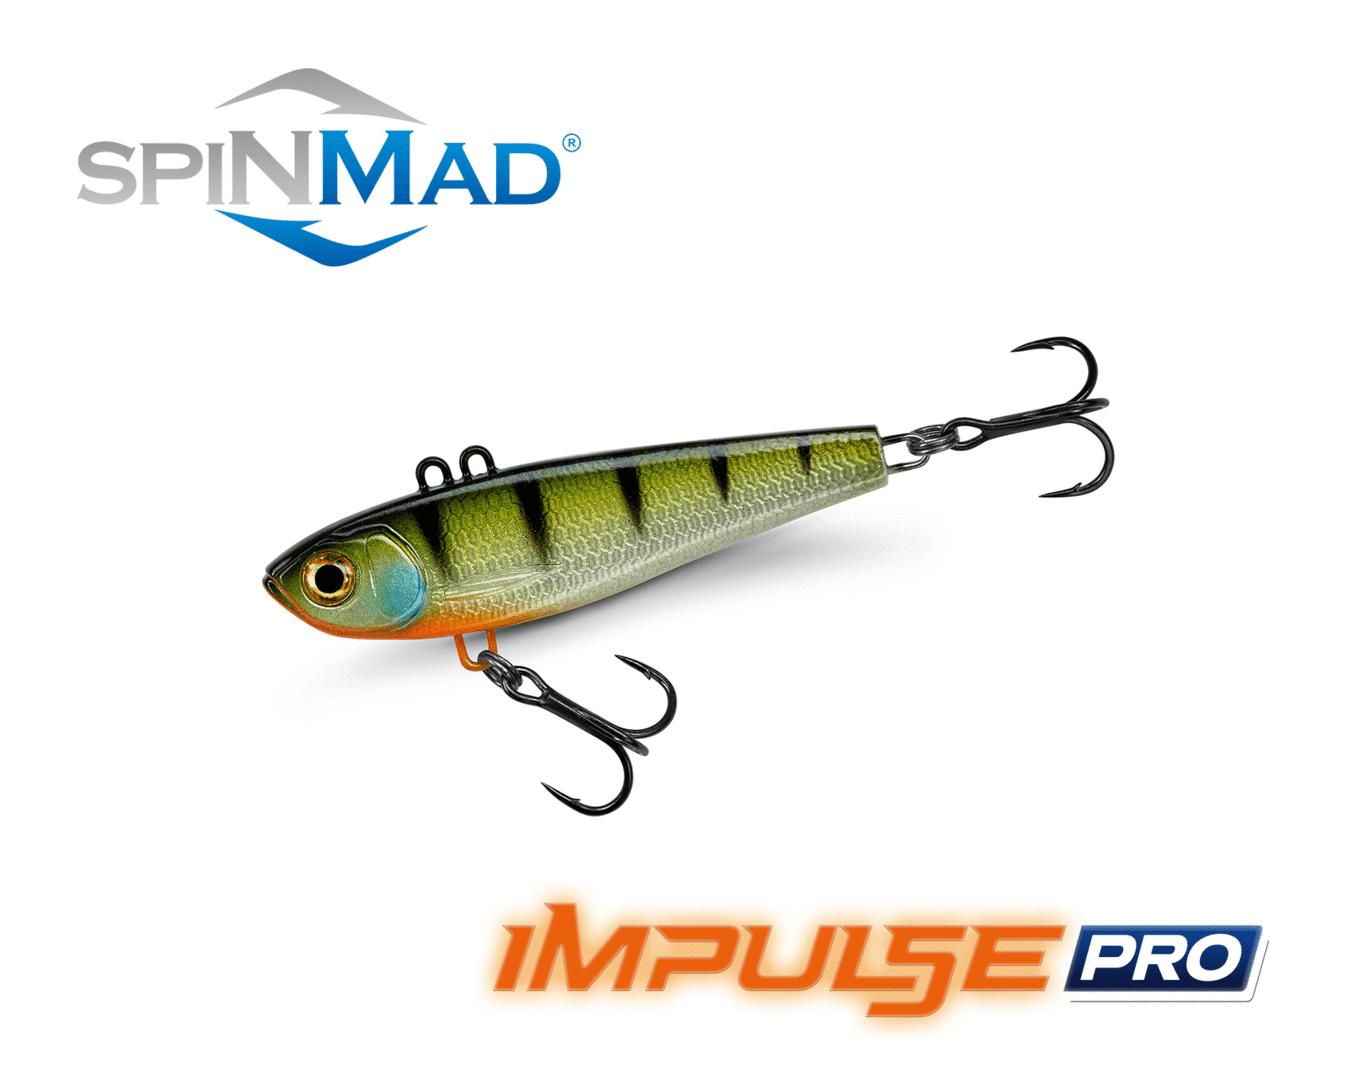 Spinmad Impulse Pro 2806